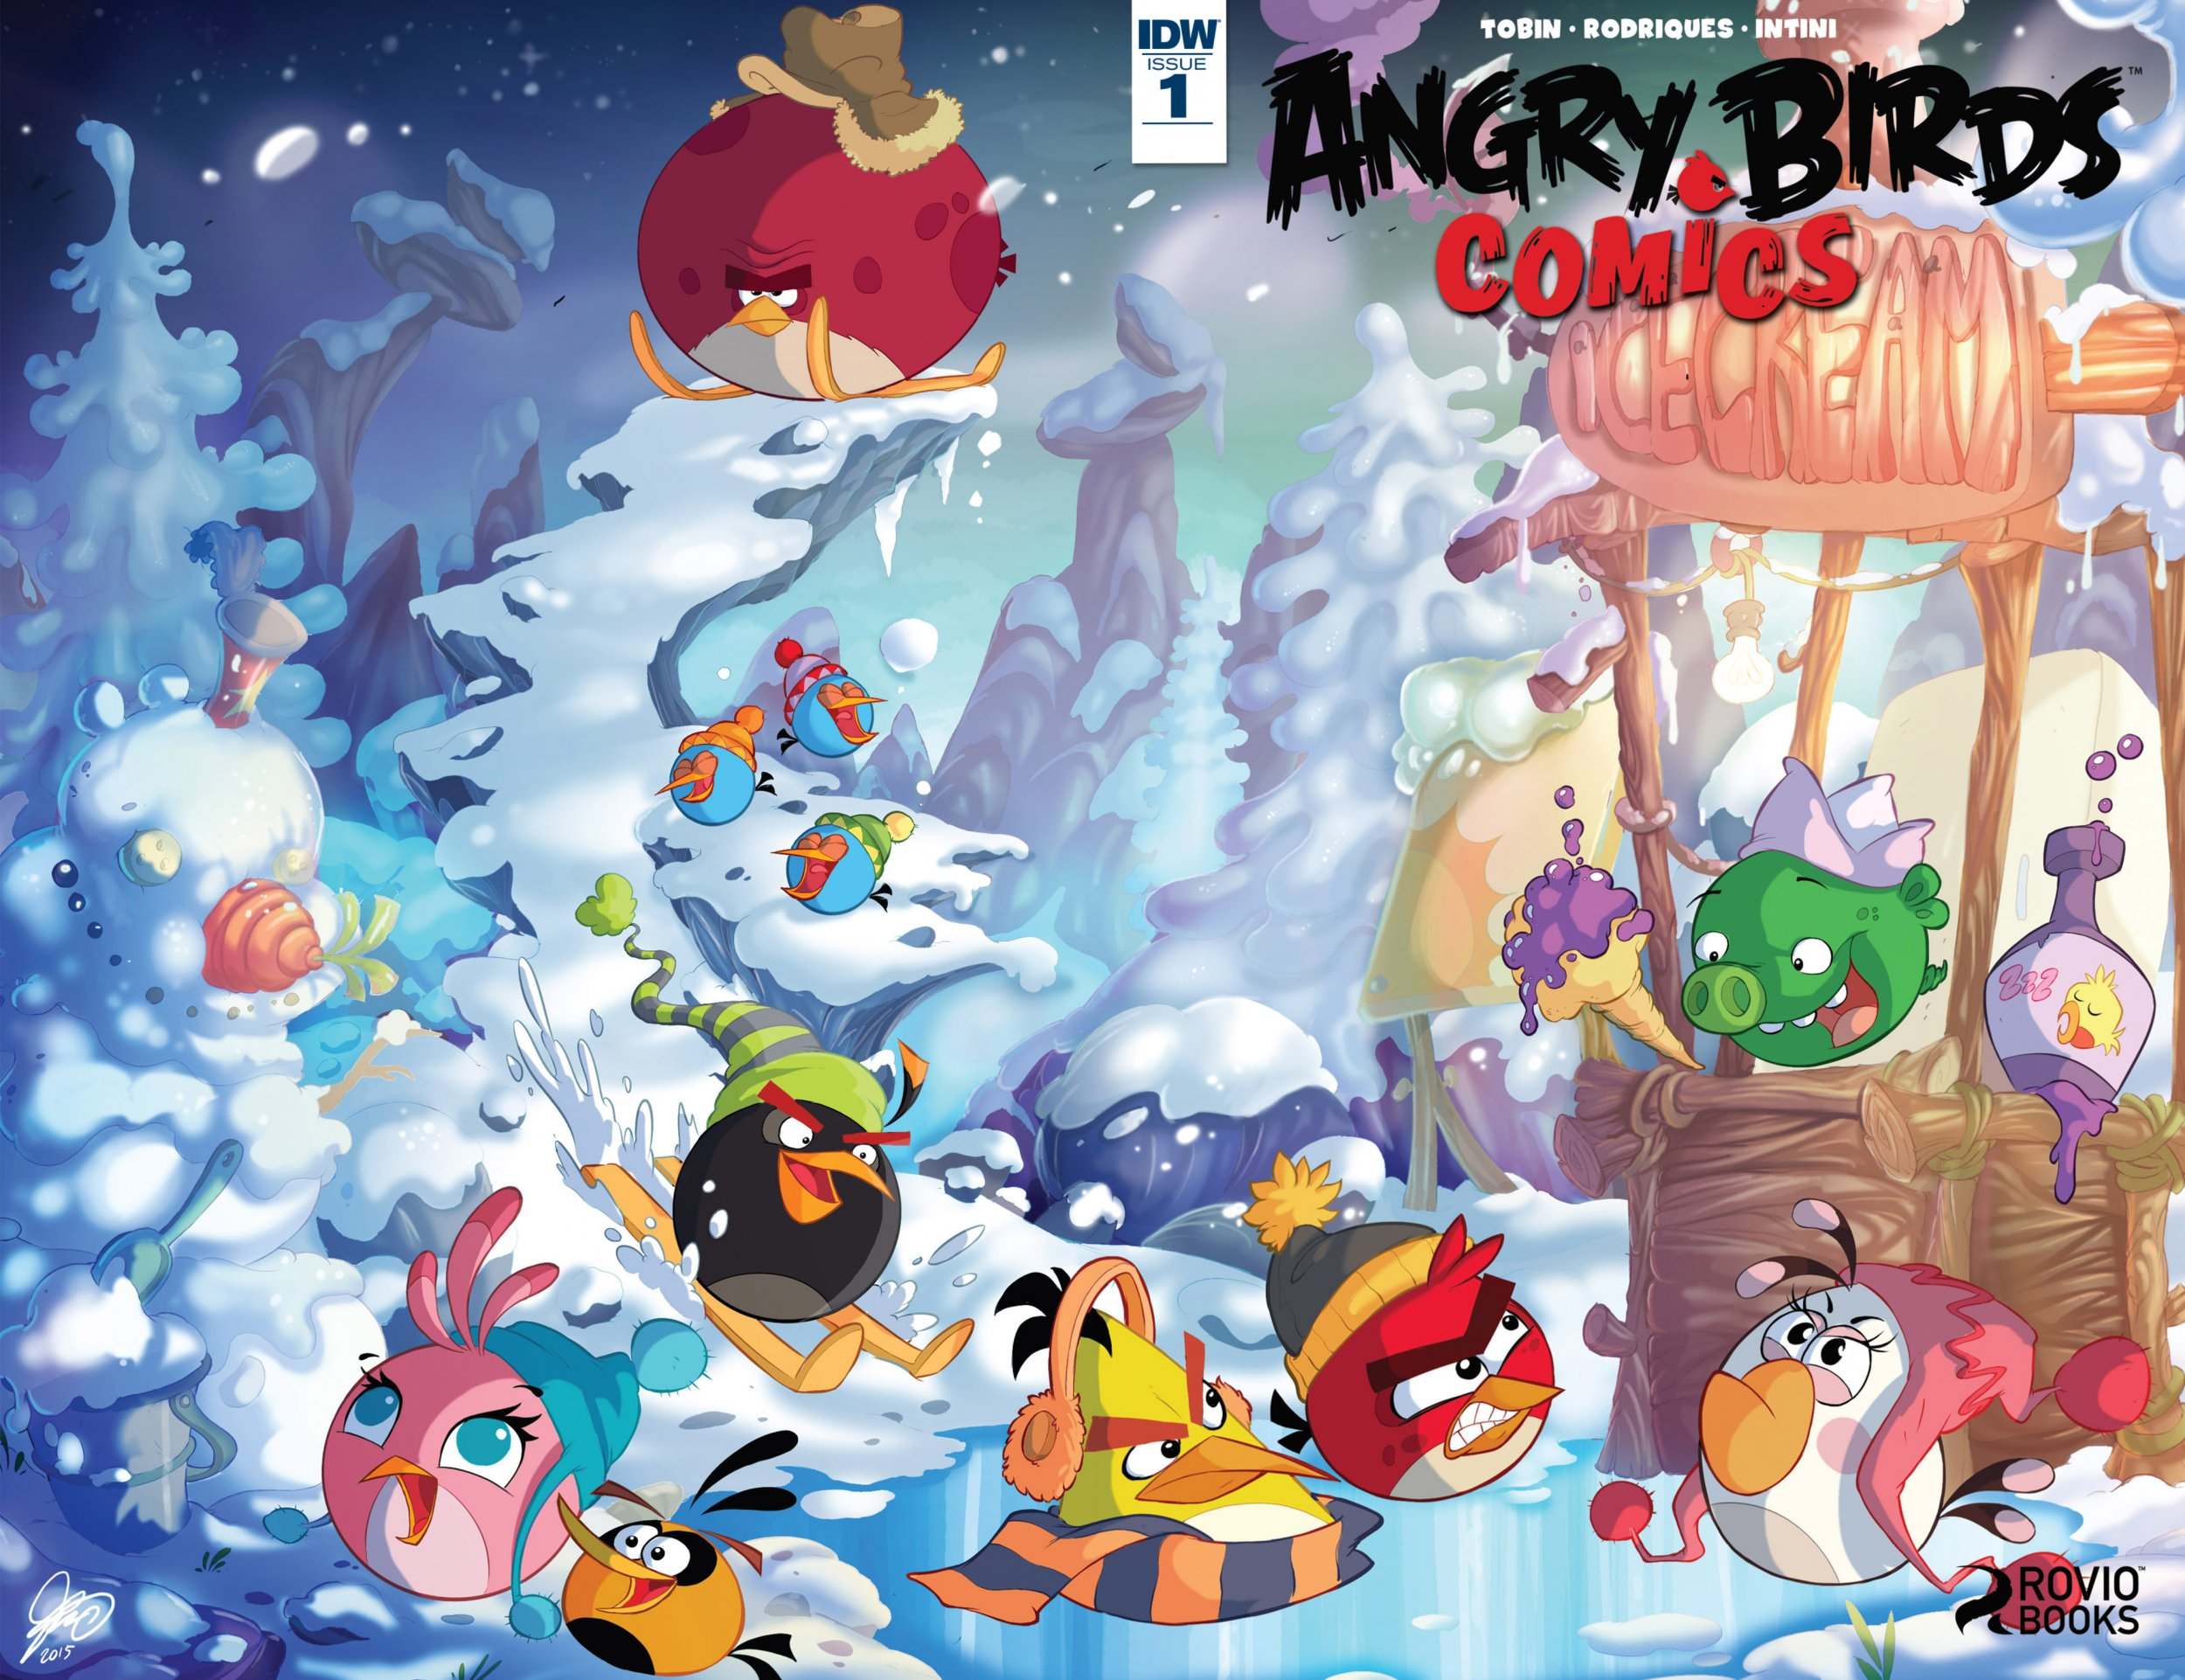 Angry Birds Comics Vol.2 001 (January 2016)